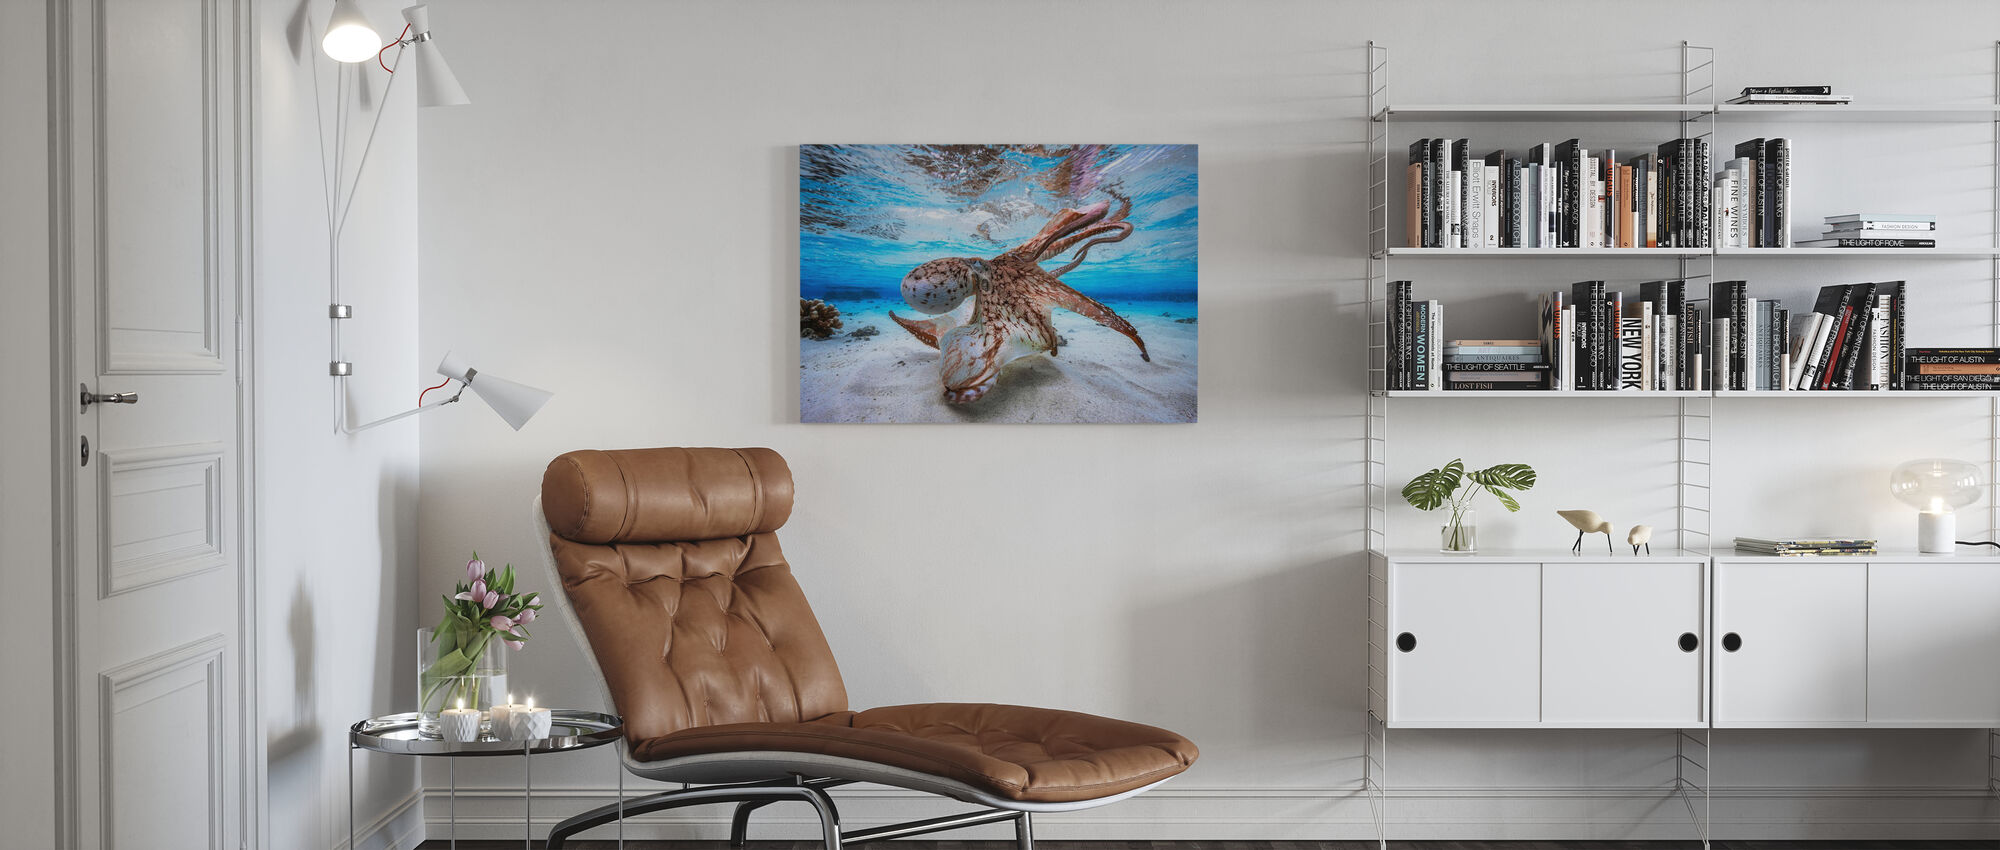 Dancing Octopus - Canvas print - Living Room